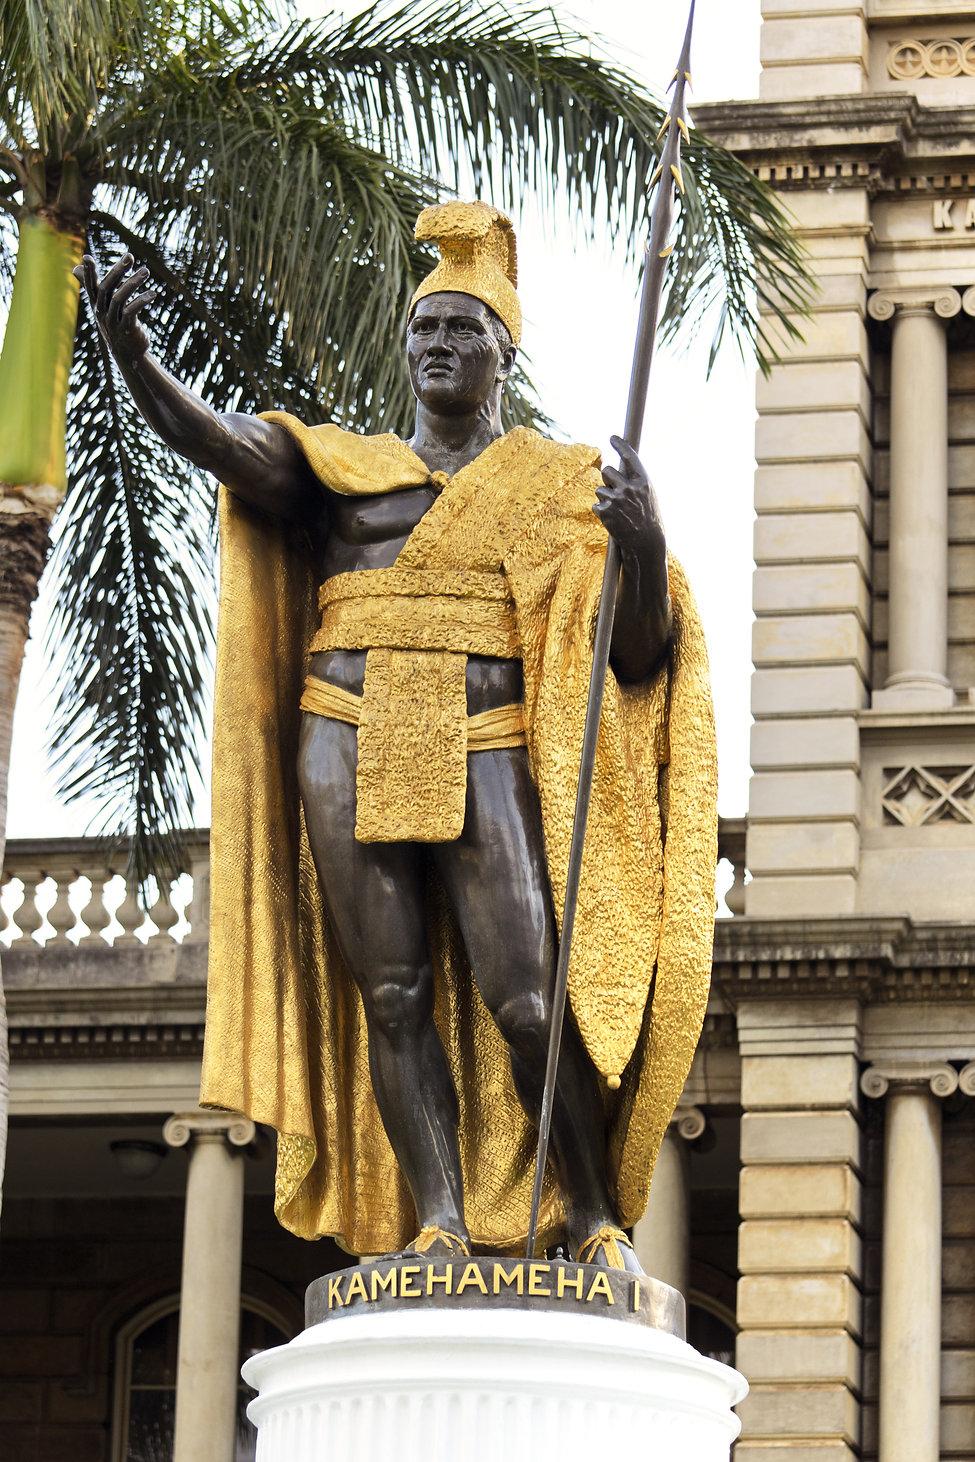 TBCS - King Kamehameha pic .jpg